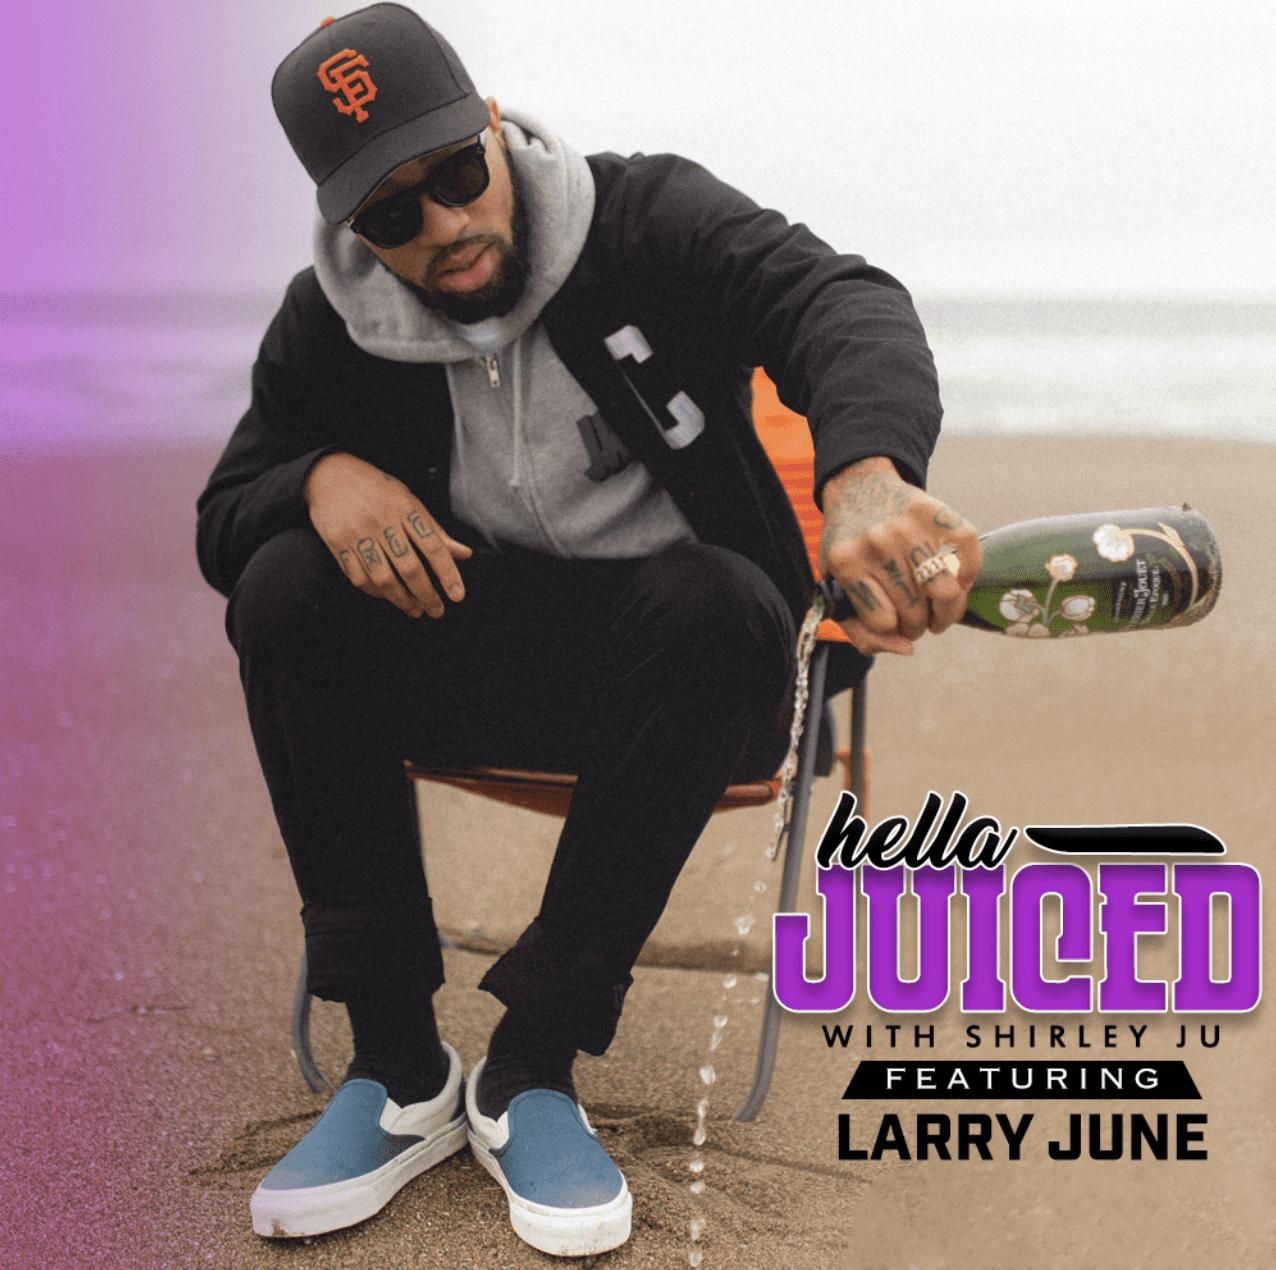 Hella Juiced: Larry June